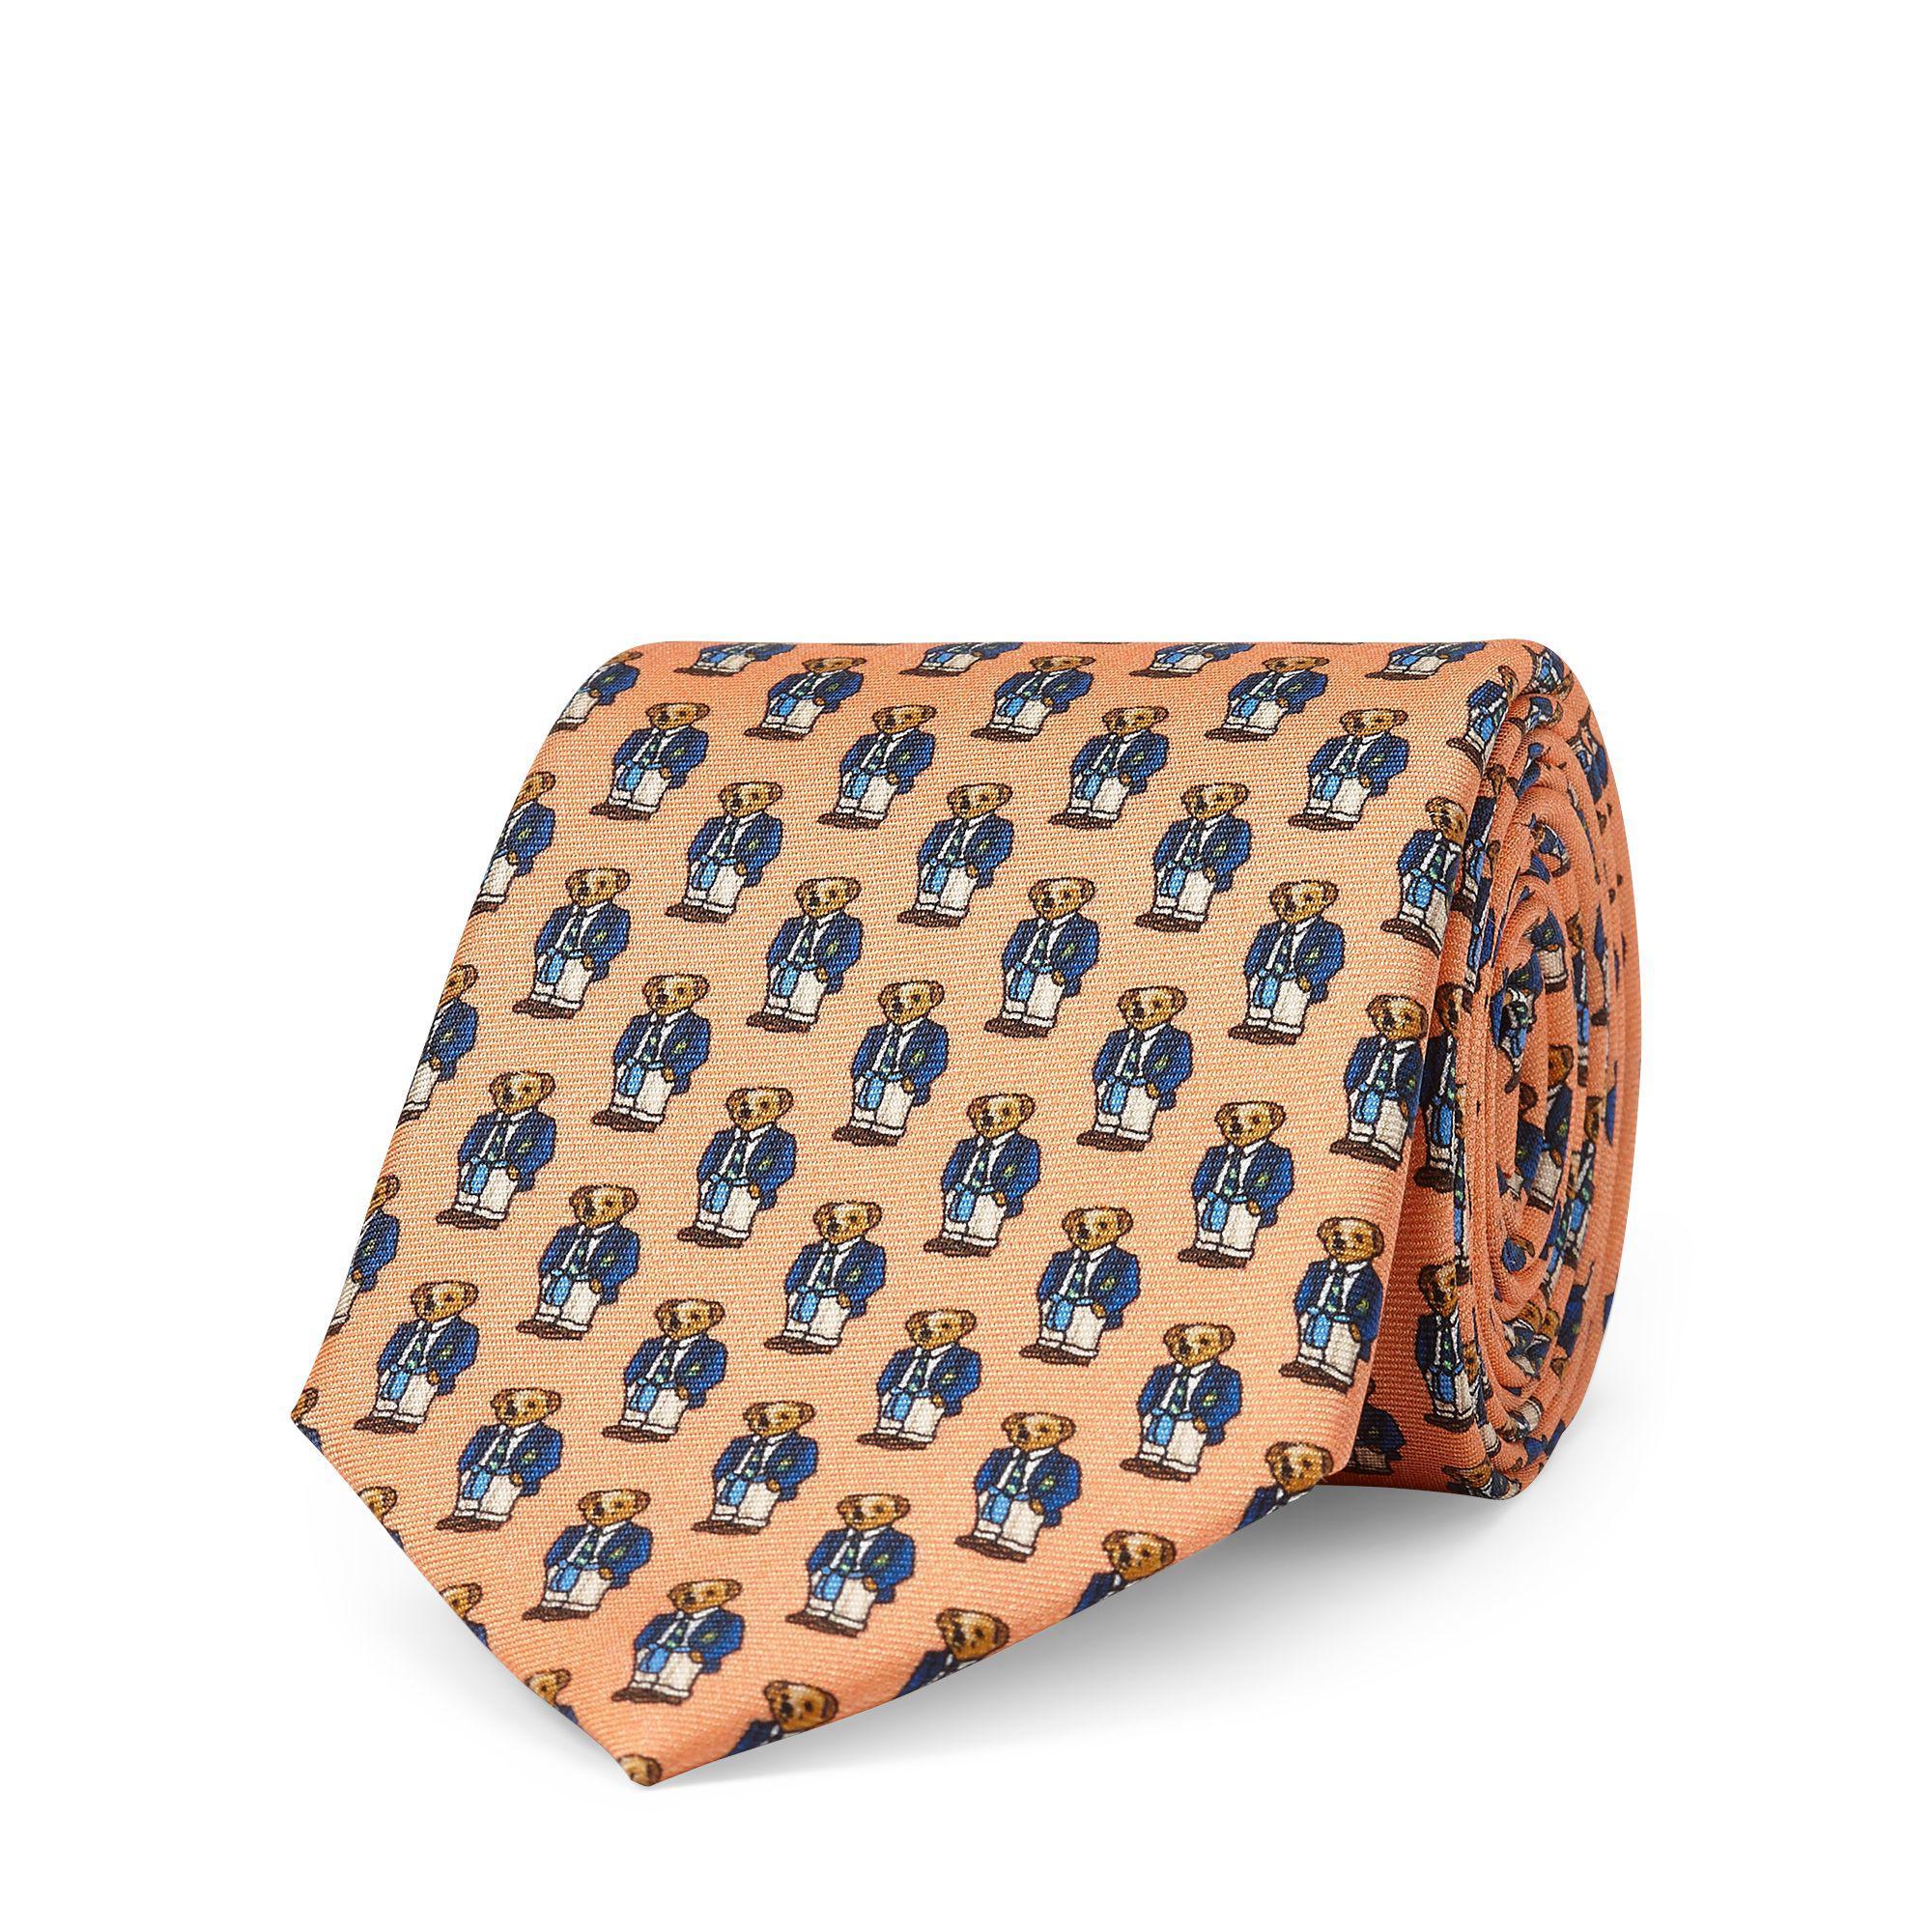 dfb08d3564 Polo Ralph Lauren Polo Bear Silk Narrow Tie in Orange for Men - Lyst